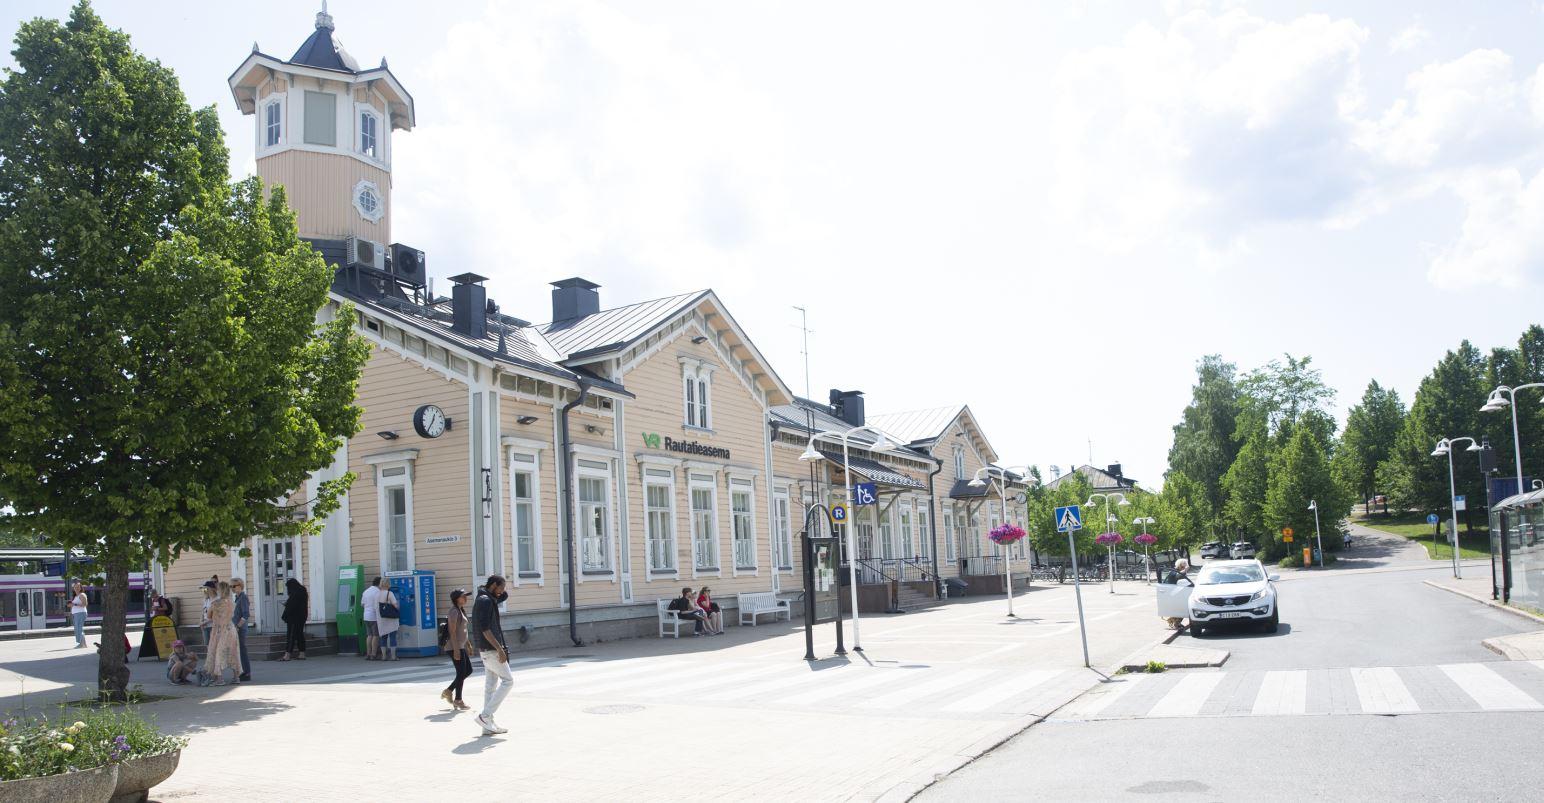 Keravan juna-aseman asemarakennus